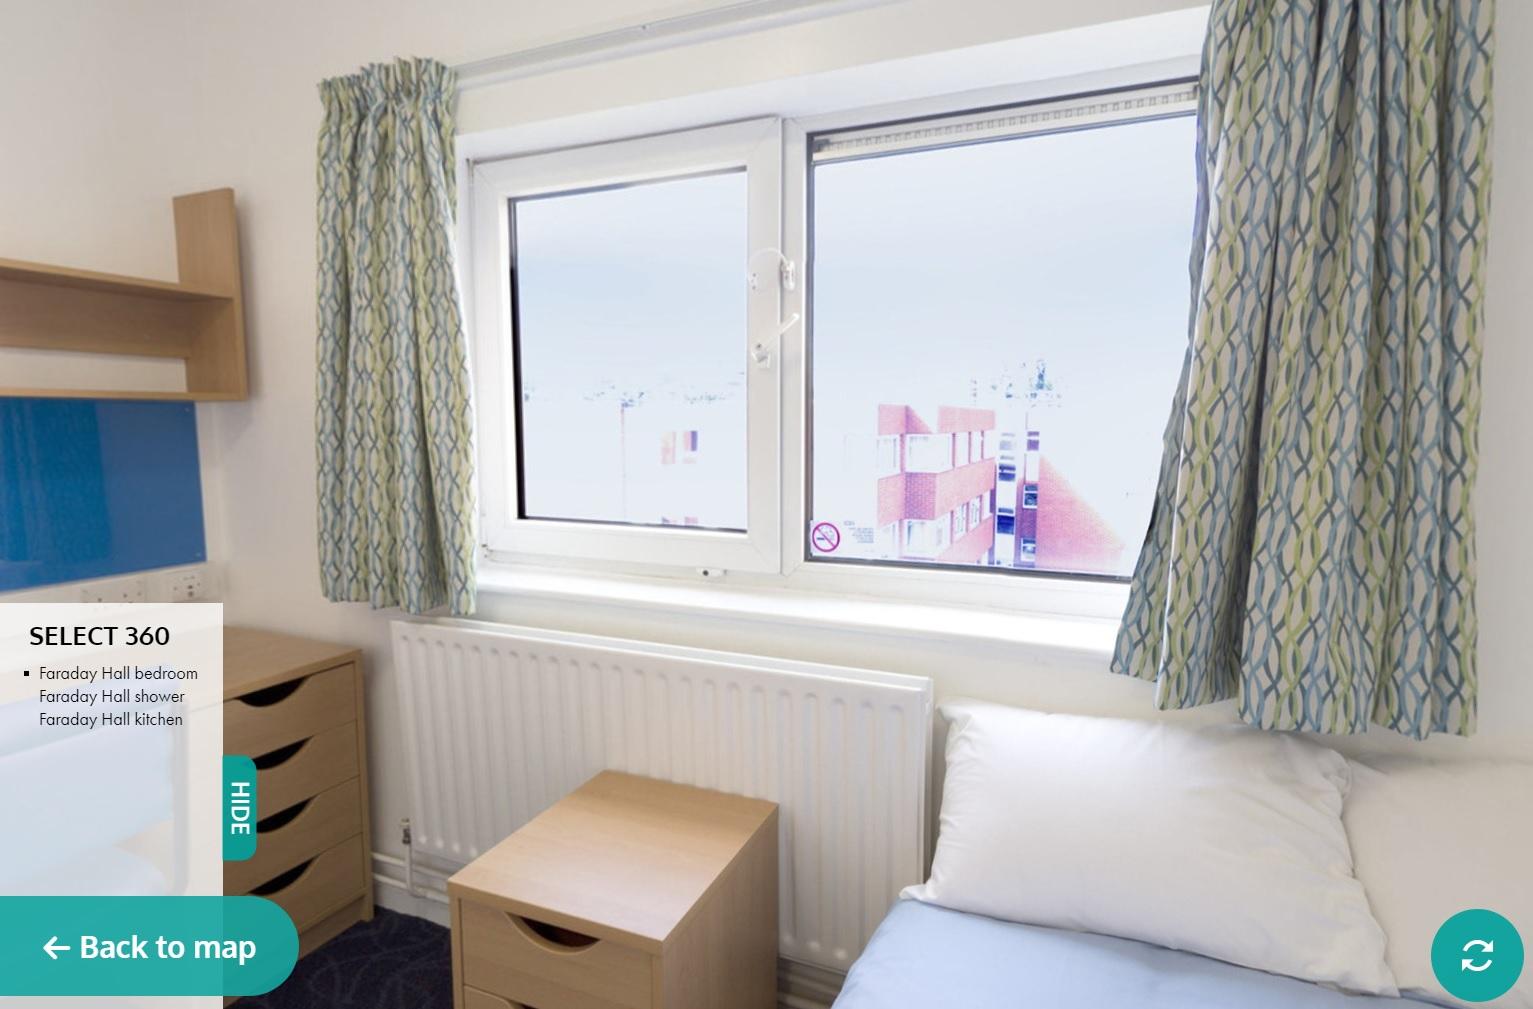 Faraday hall brunel university london for Hall window design